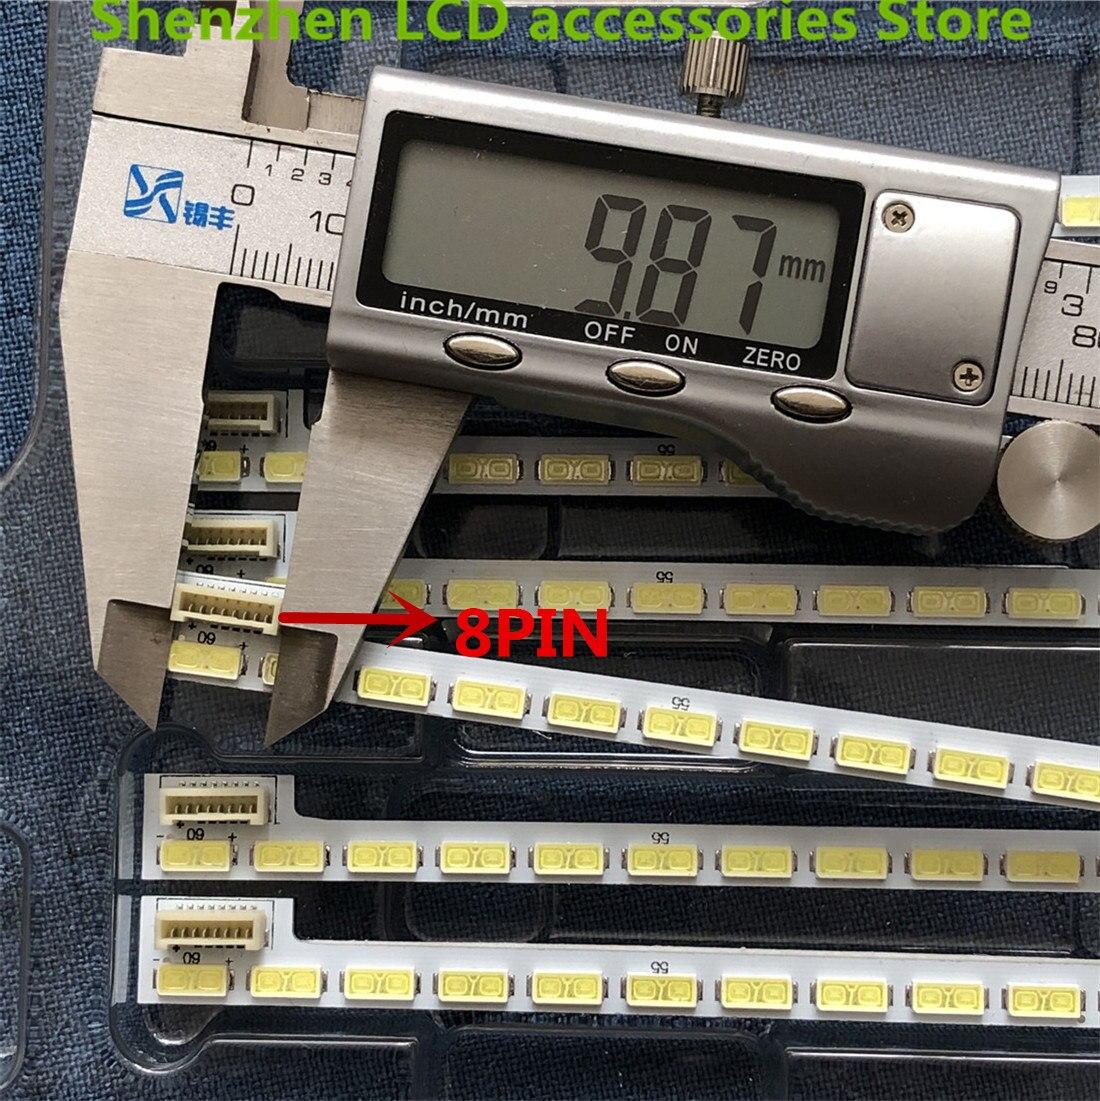 2 teile/los 60LED 525mm led-hintergrundbeleuchtung streifen für LG 42LS570T 42LS570S 42LS575S T420HVN01.0 42 zoll 7030PKG 60ea 74.42T23.001- 2-DS1